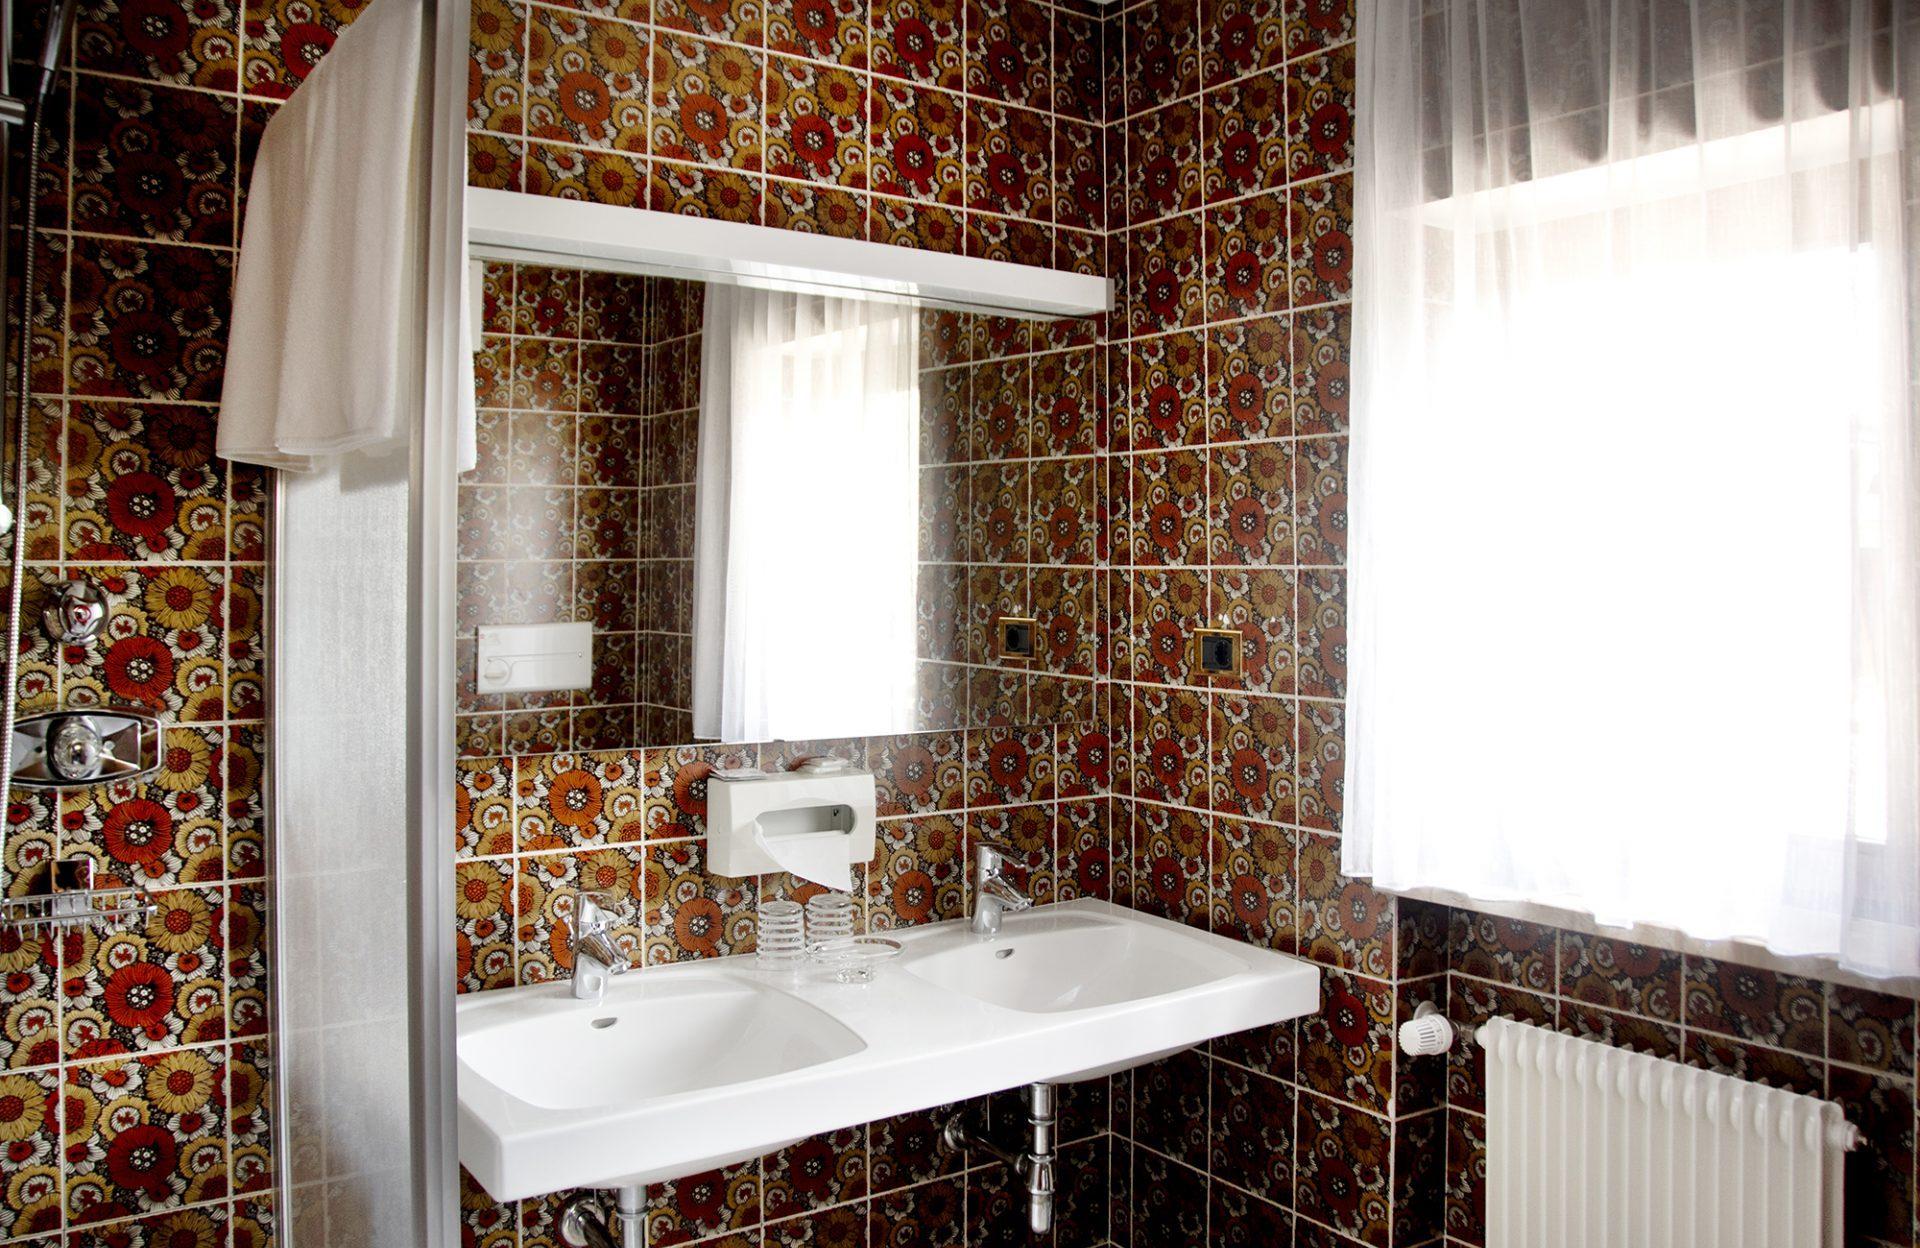 Residence Mayr bathroom